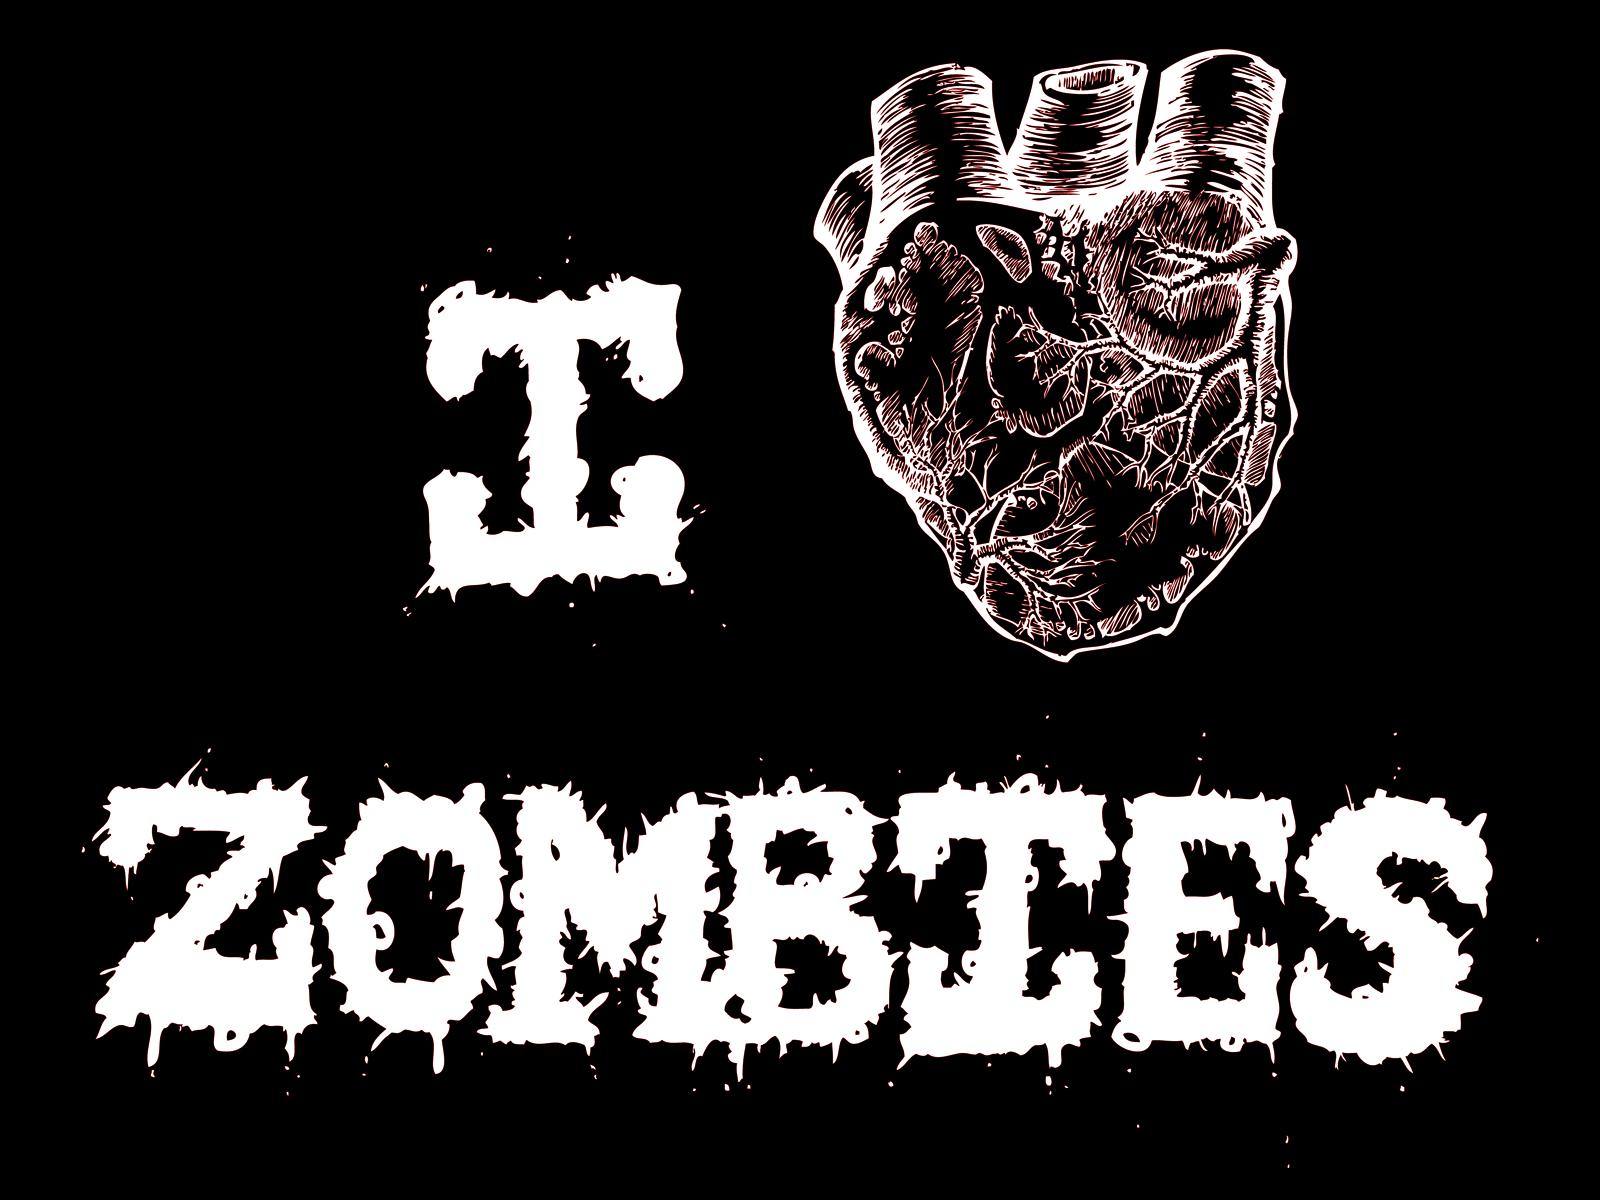 apocalypse background wallpaper zombie